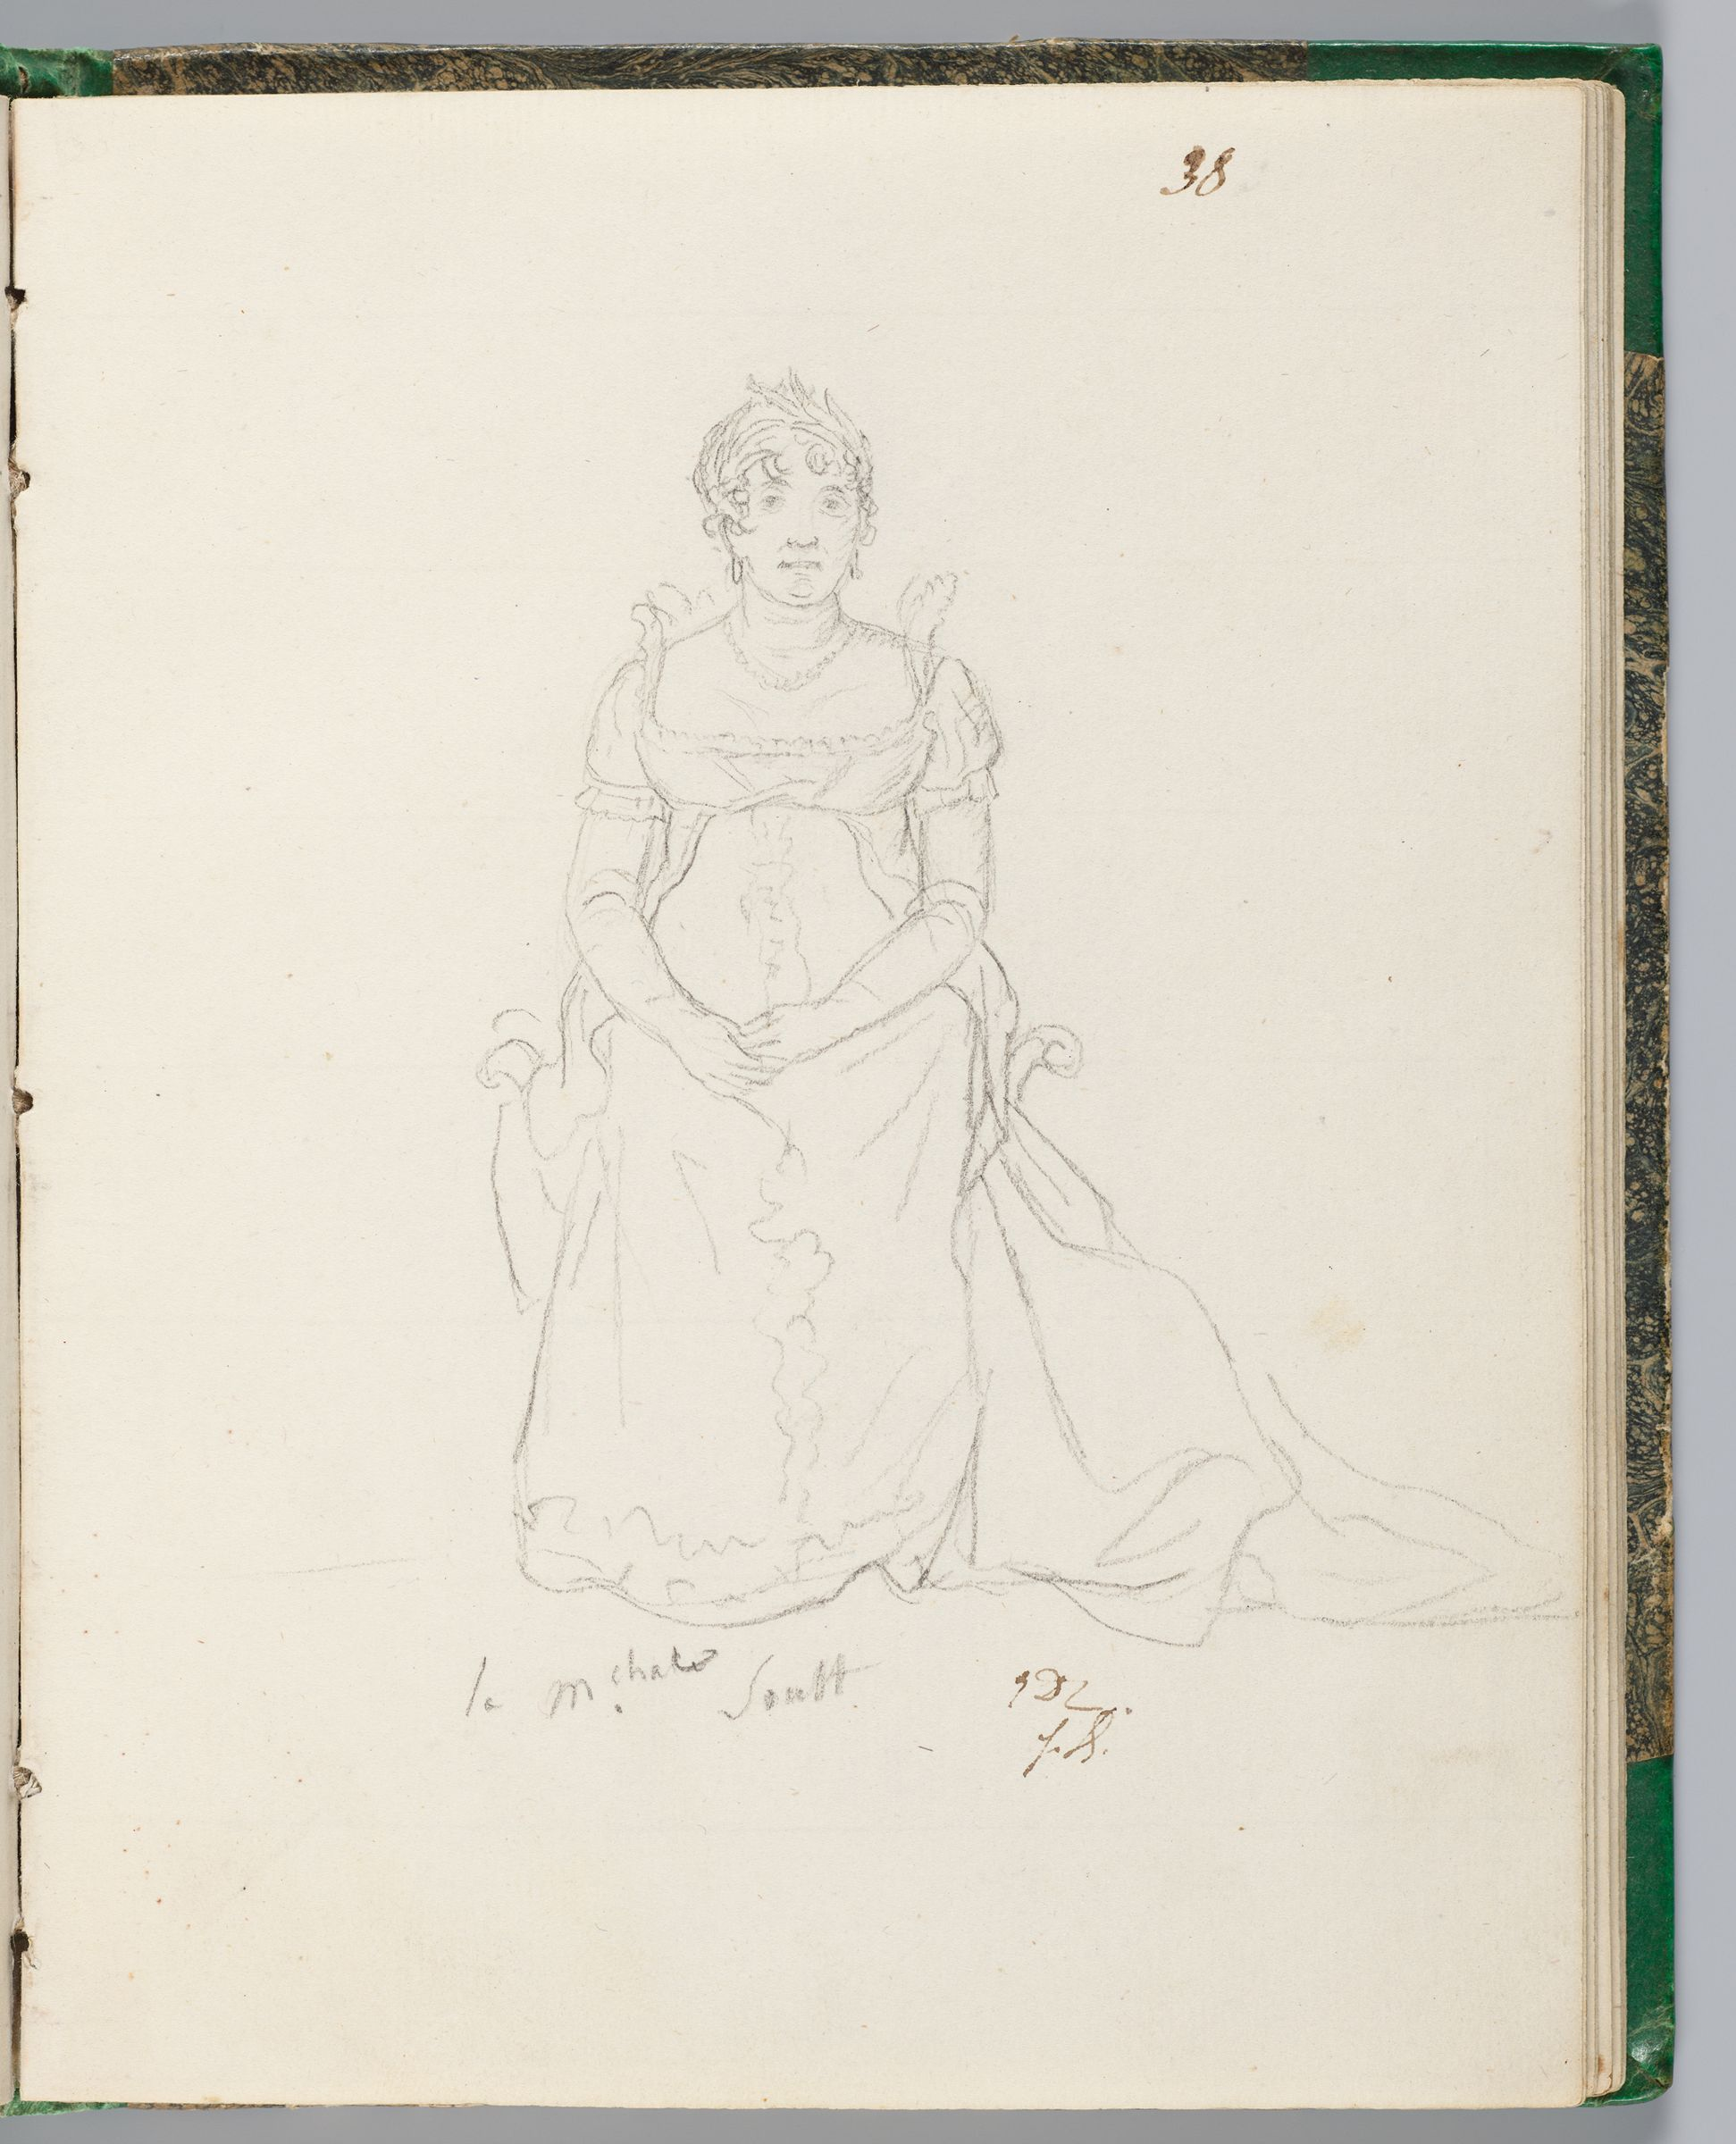 Madame La Maréchale Soult, Lady-In-Waiting To Madame Mère